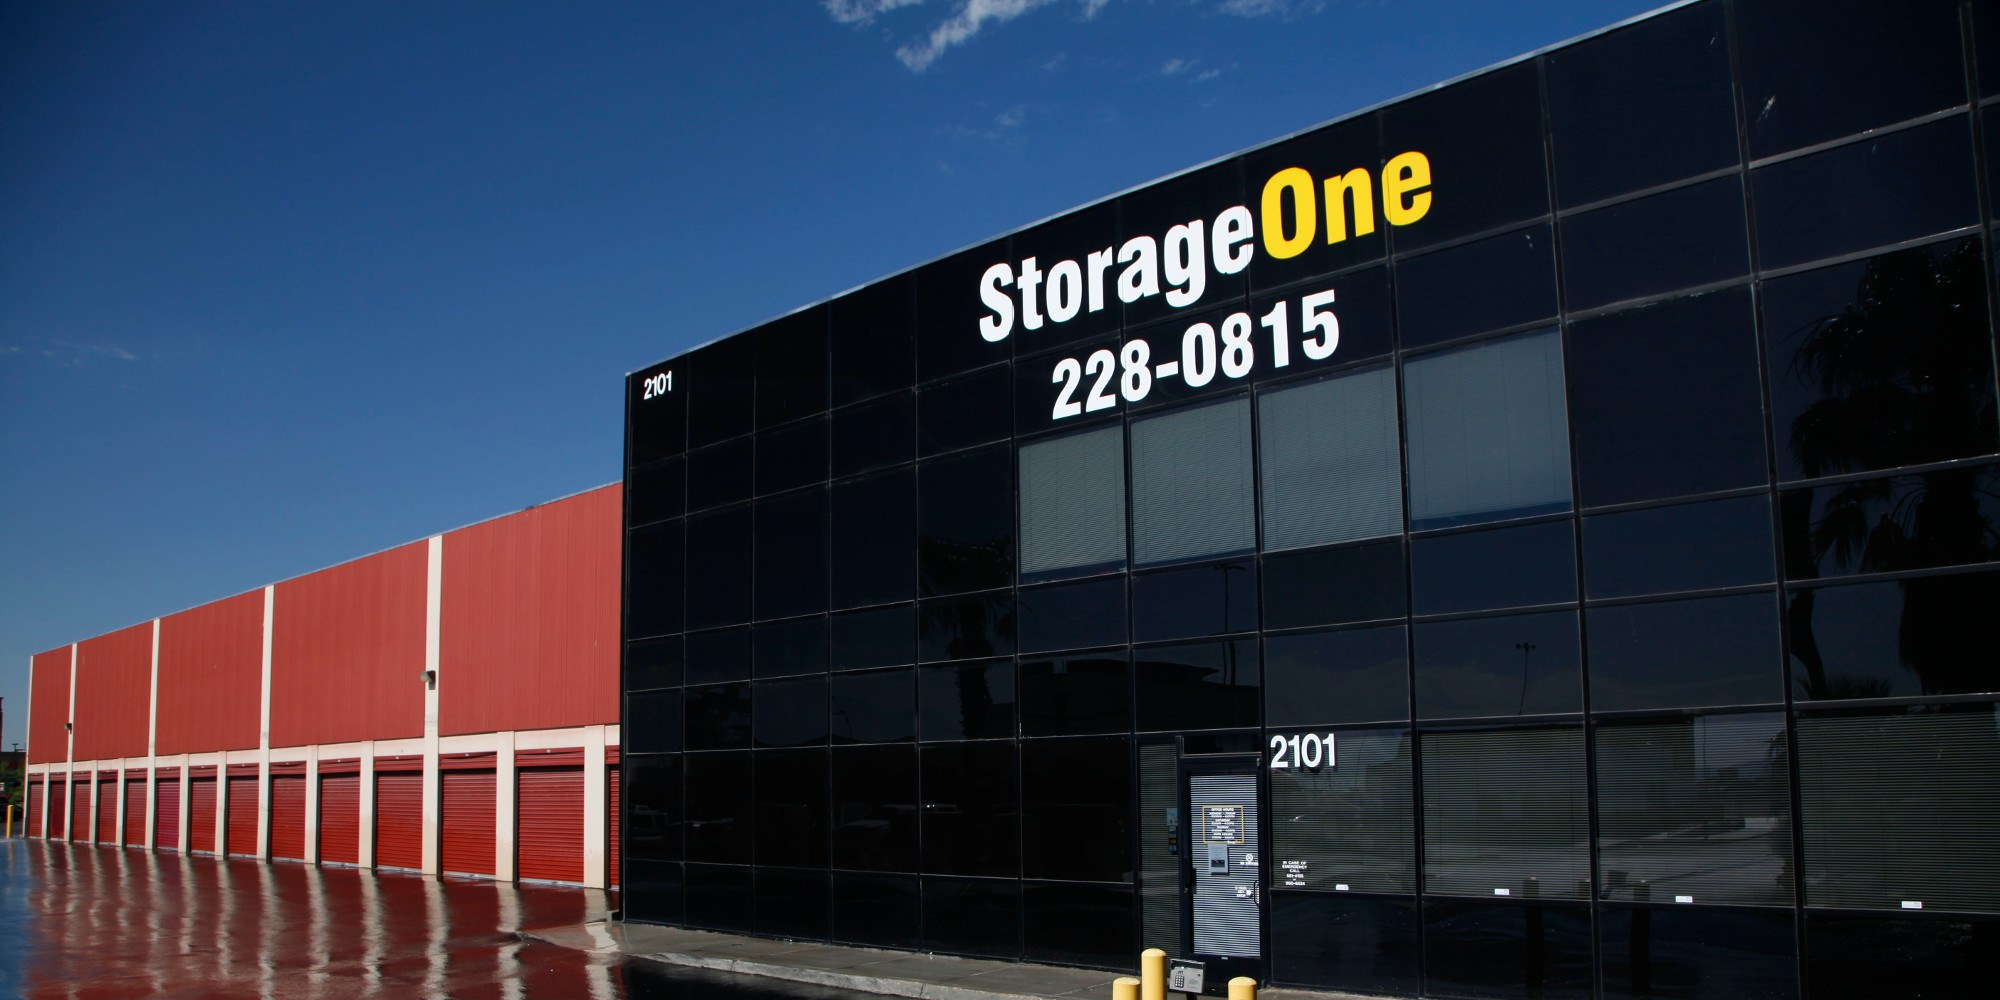 self storage units in las vegas nv storageone lake mead u s 95. Black Bedroom Furniture Sets. Home Design Ideas